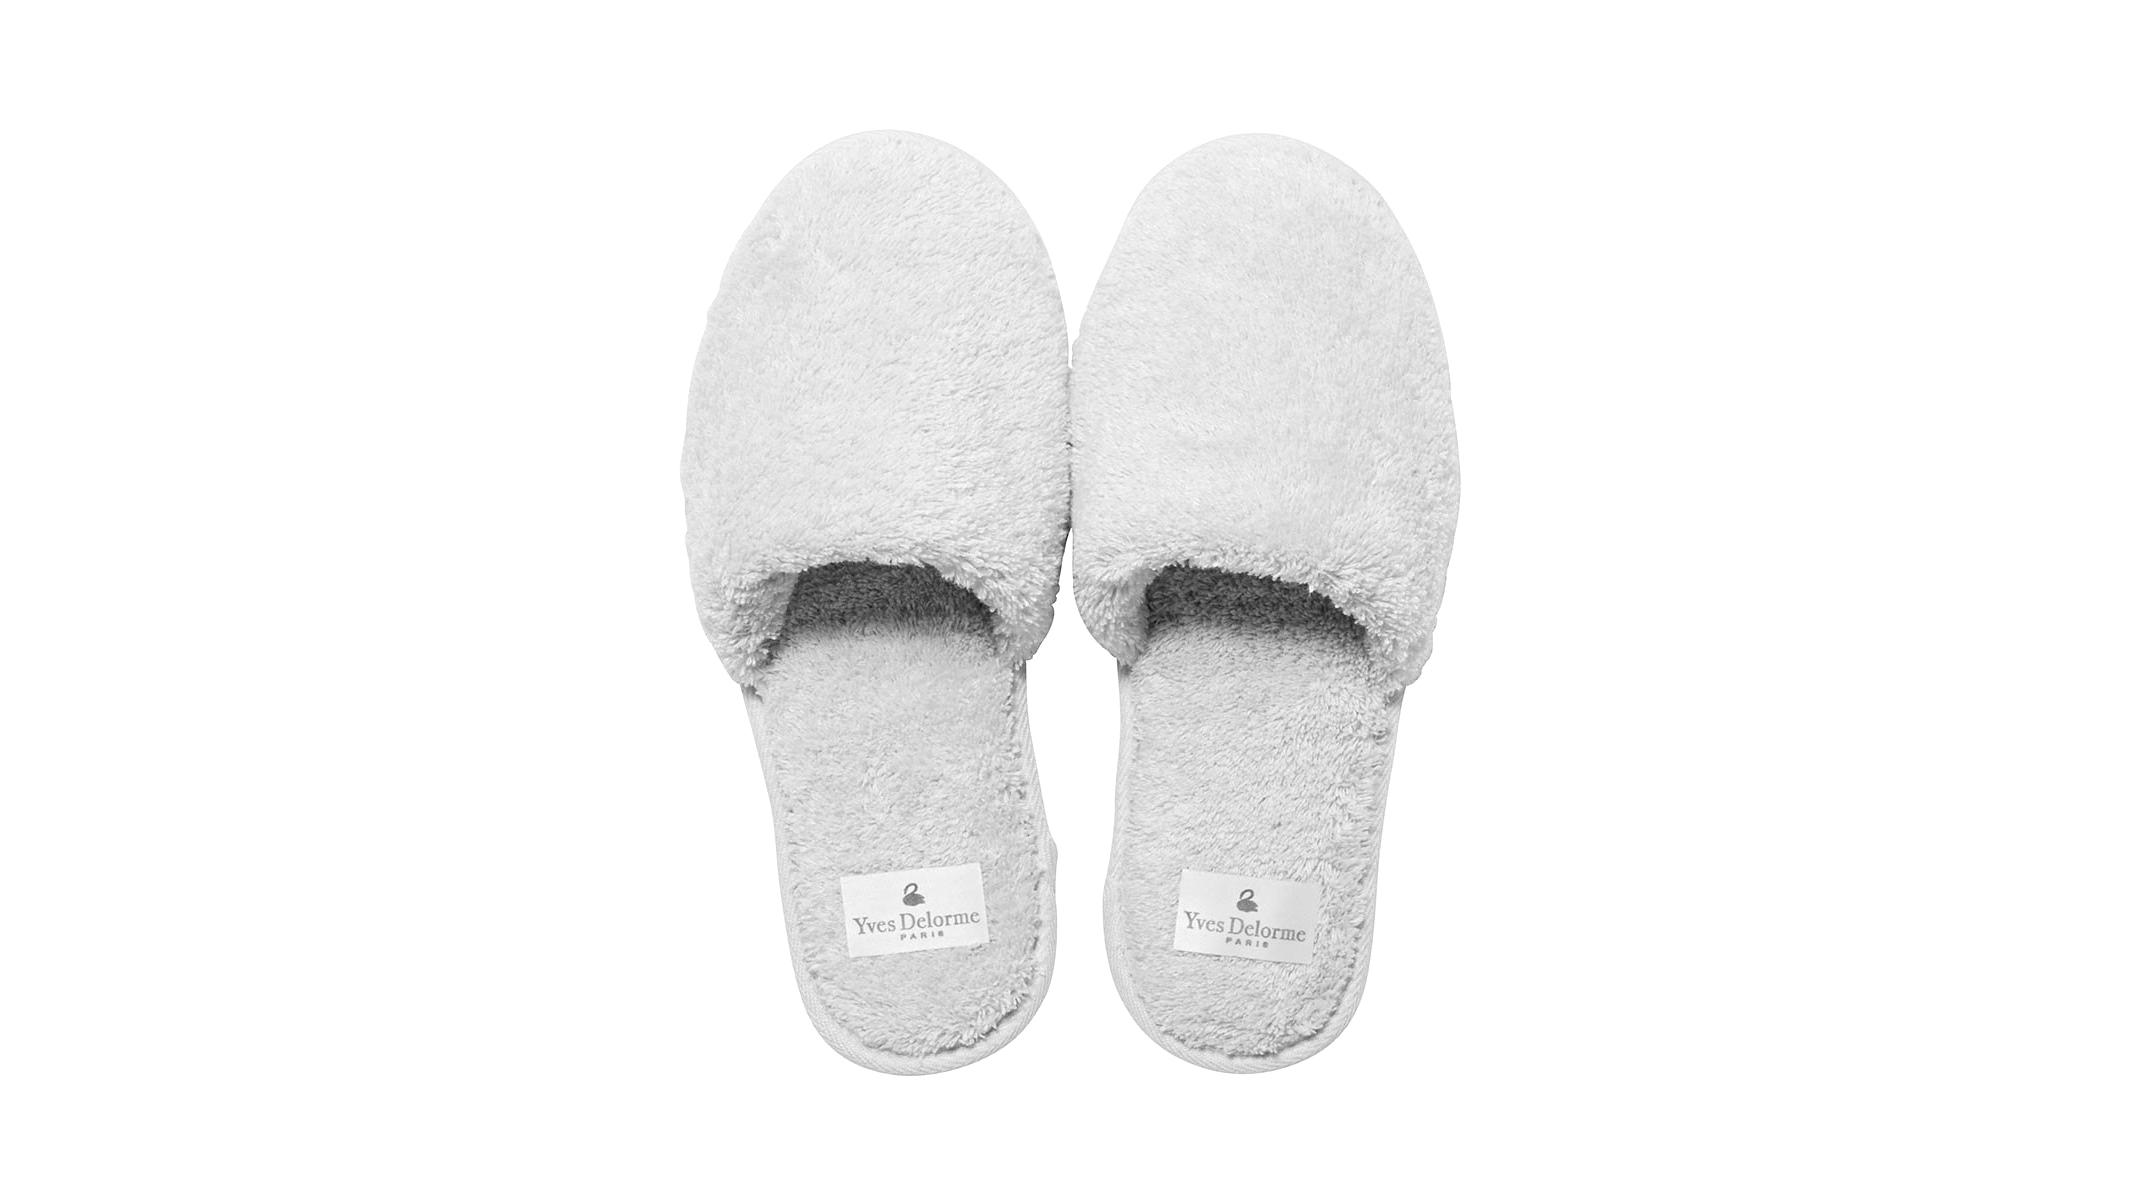 yves delorme etoile slippers